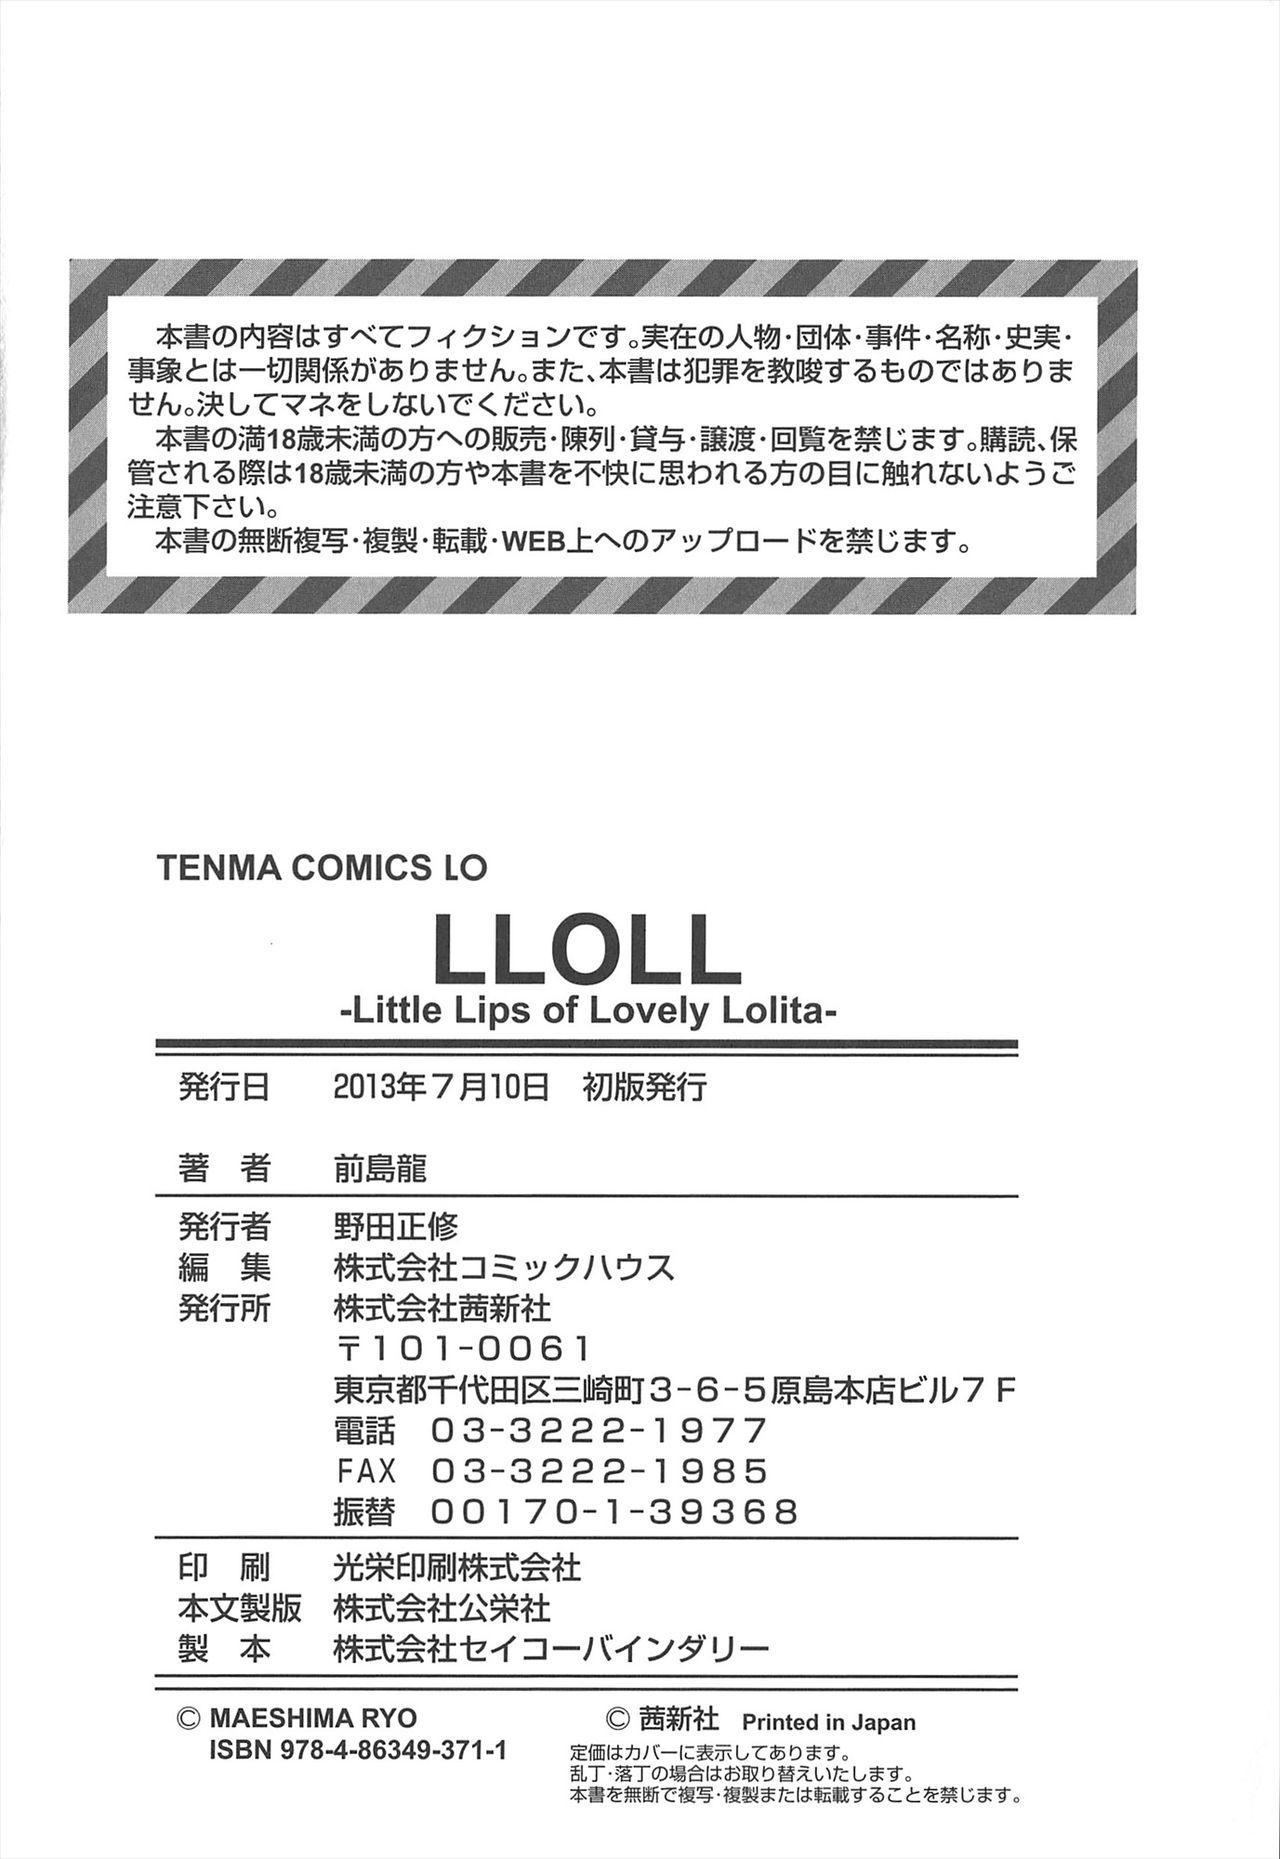 LLOLL 223